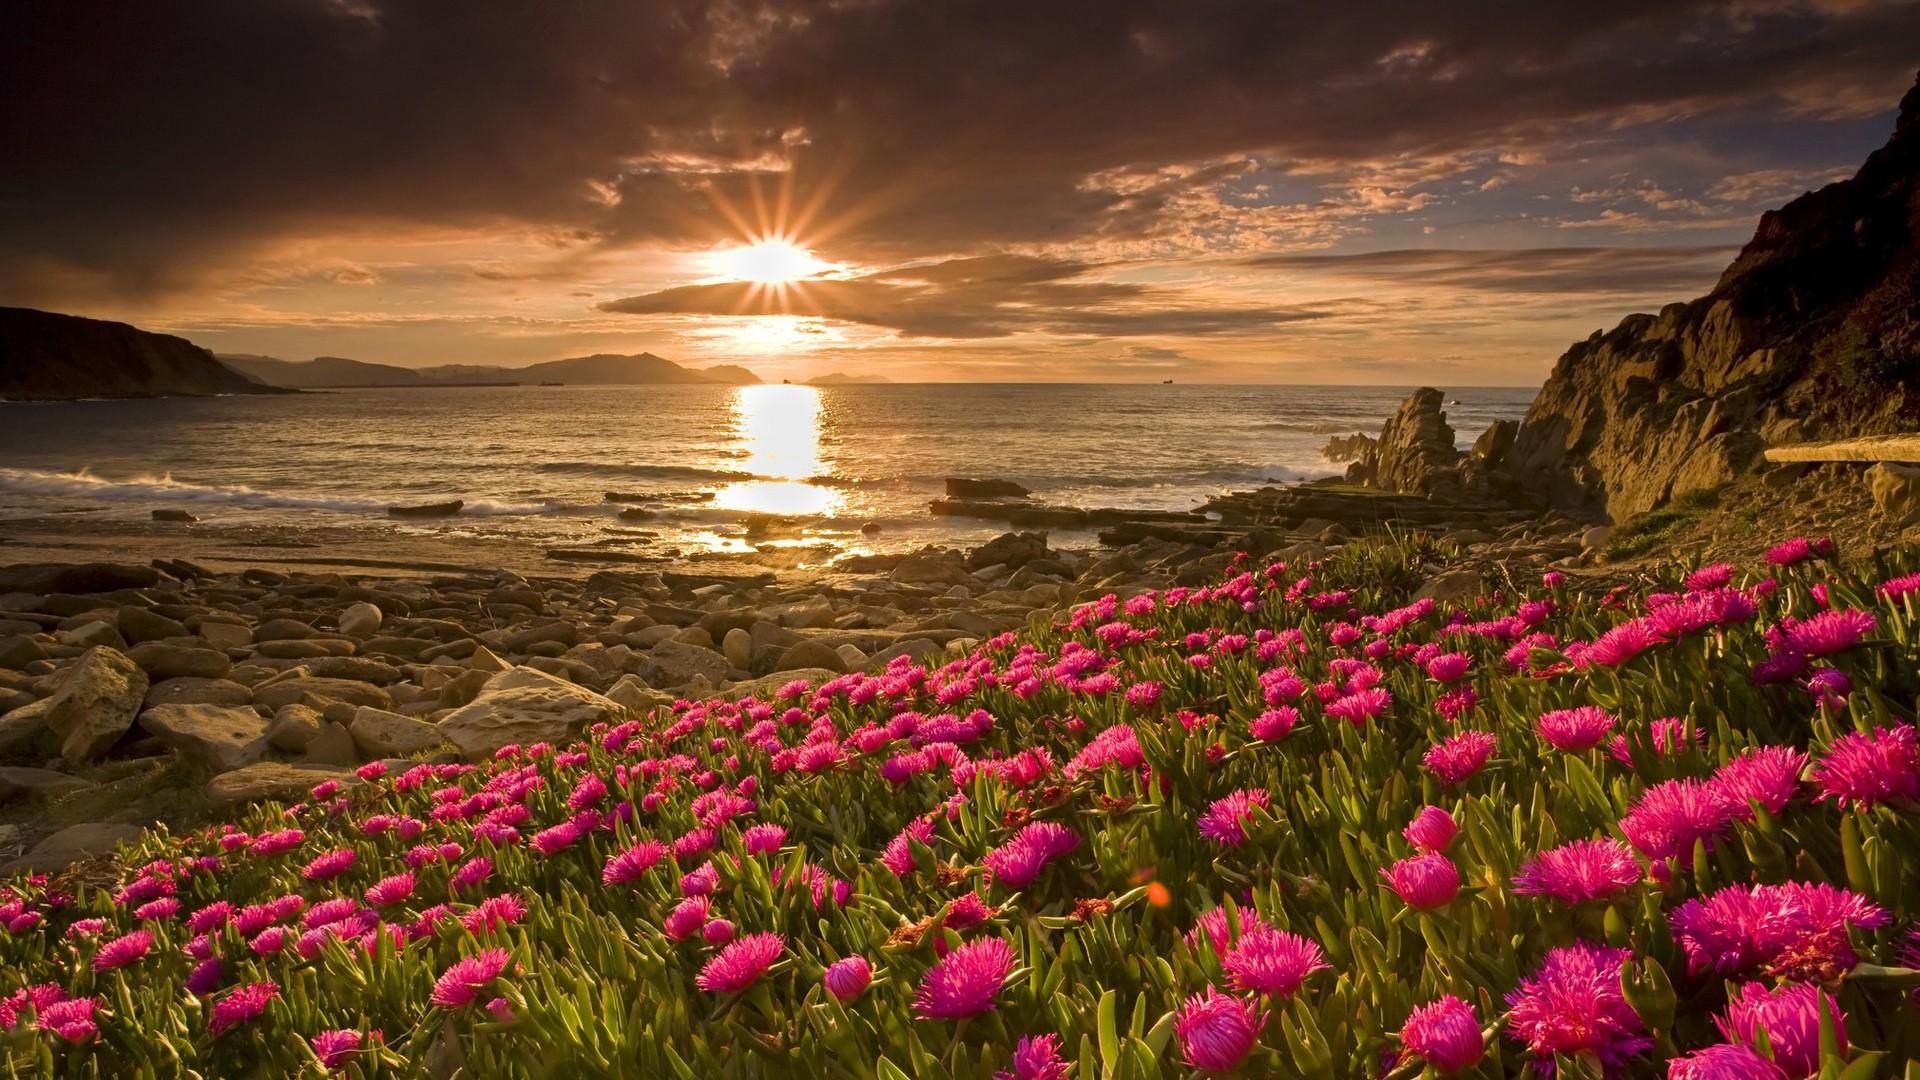 flower landscape hd nature